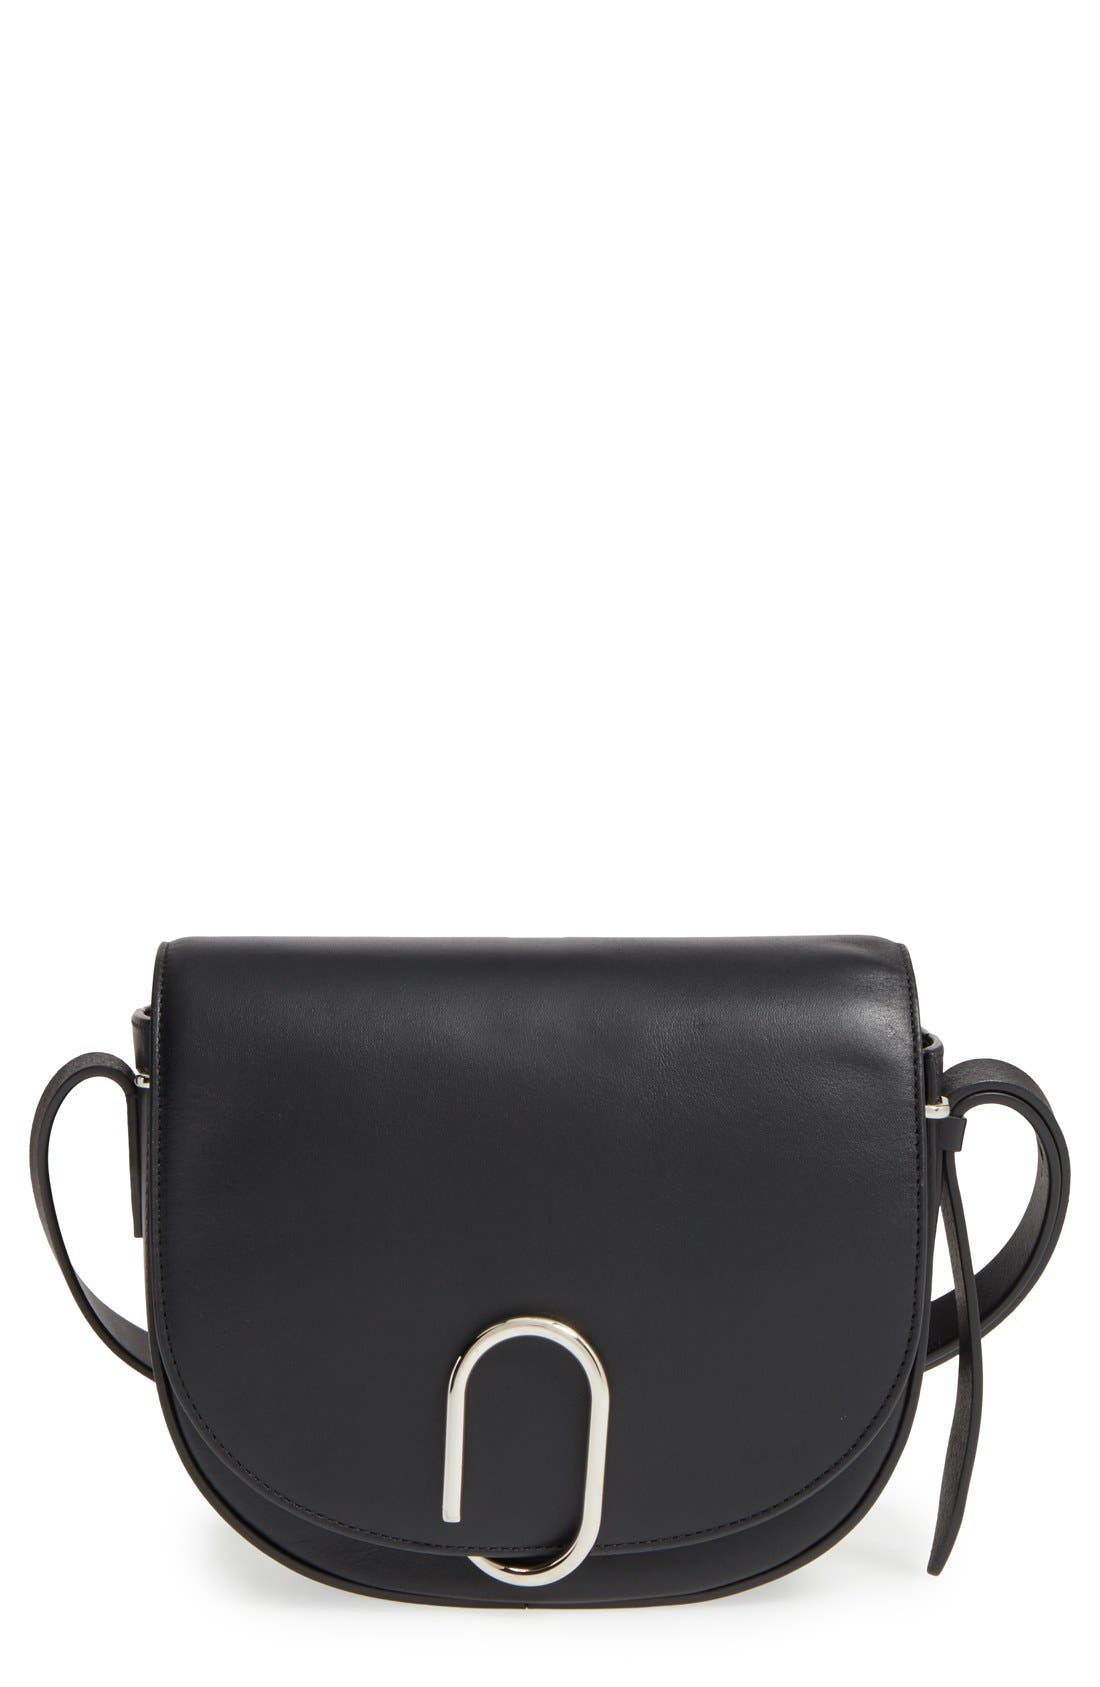 Alix Leather Saddle Bag,                         Main,                         color, 001